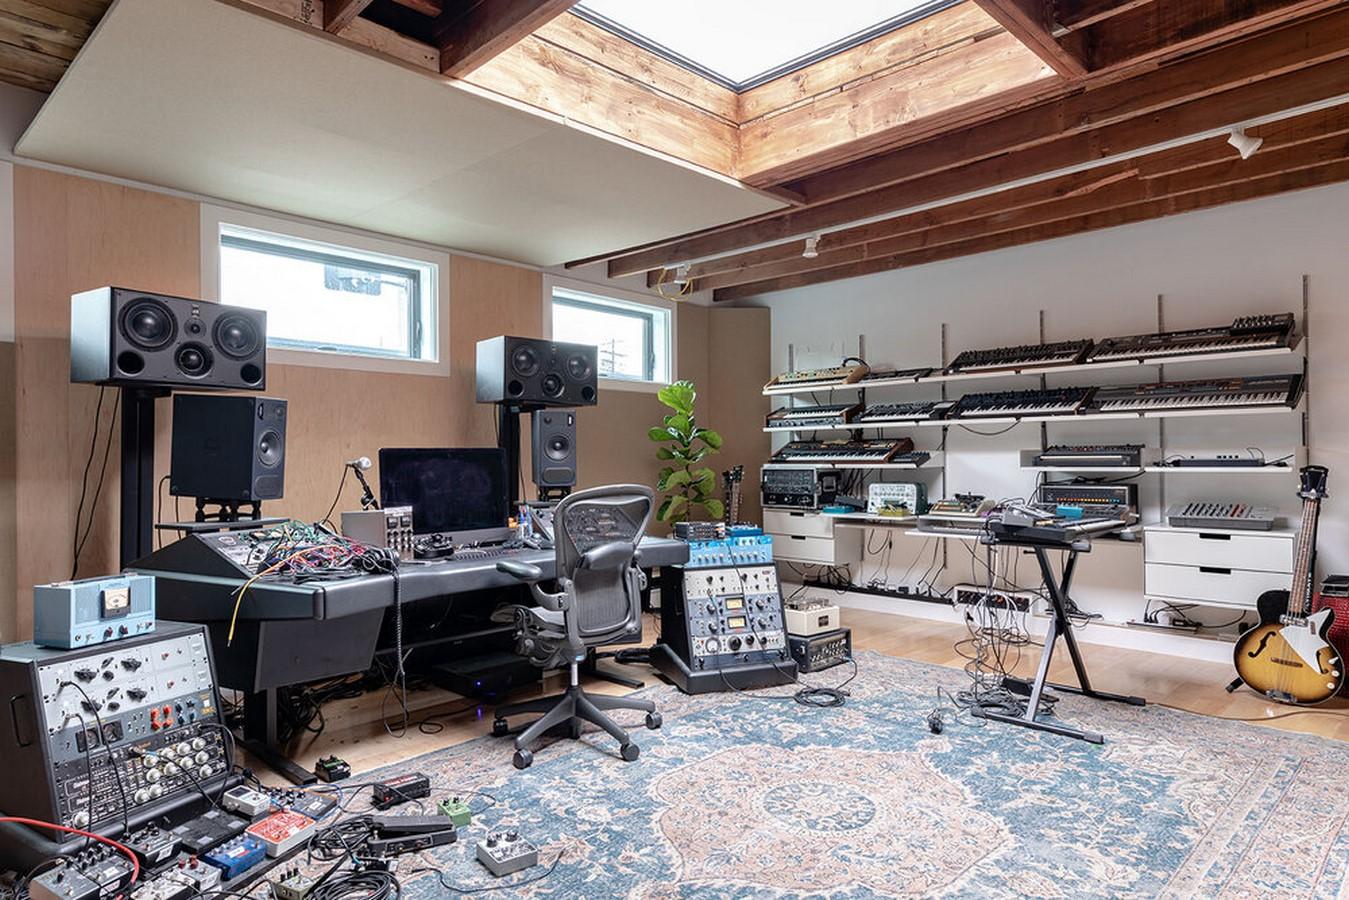 VENICE BEACH RECORDING STUDIO - Sheet3